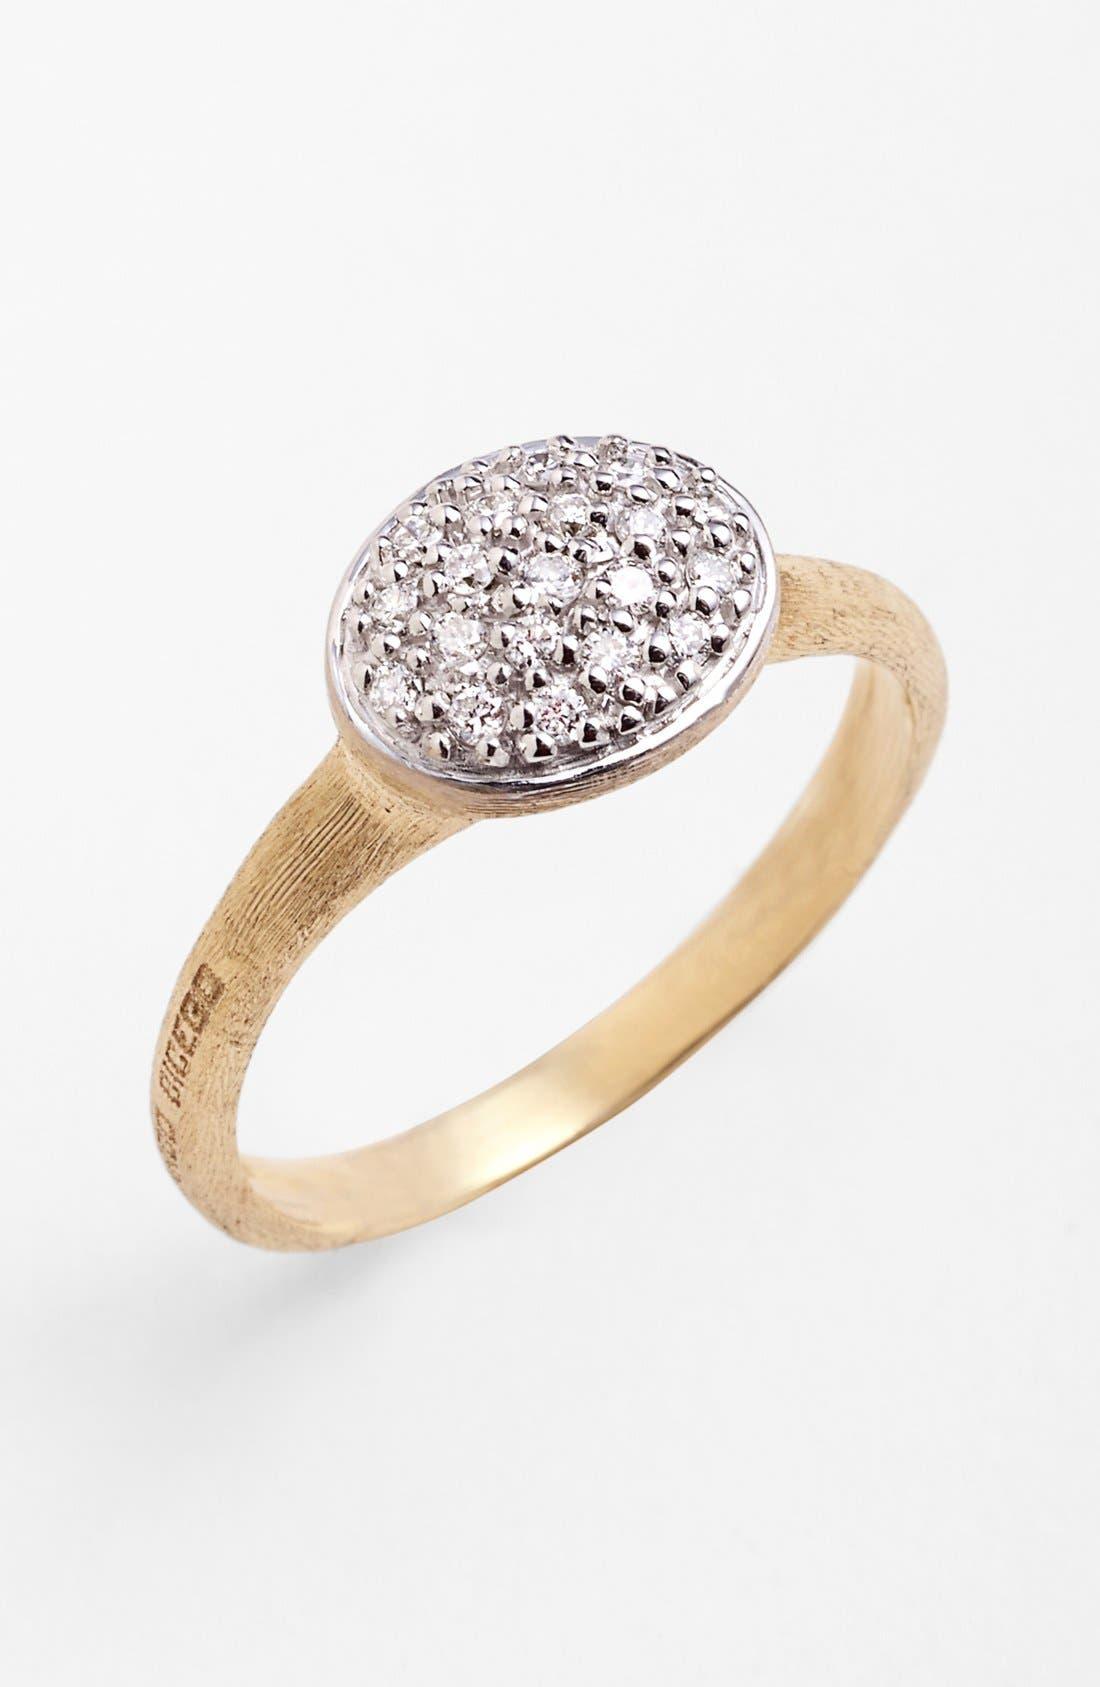 Alternate Image 1 Selected - Marco Bicego 'Siviglia' Small Diamond Cocktail Ring